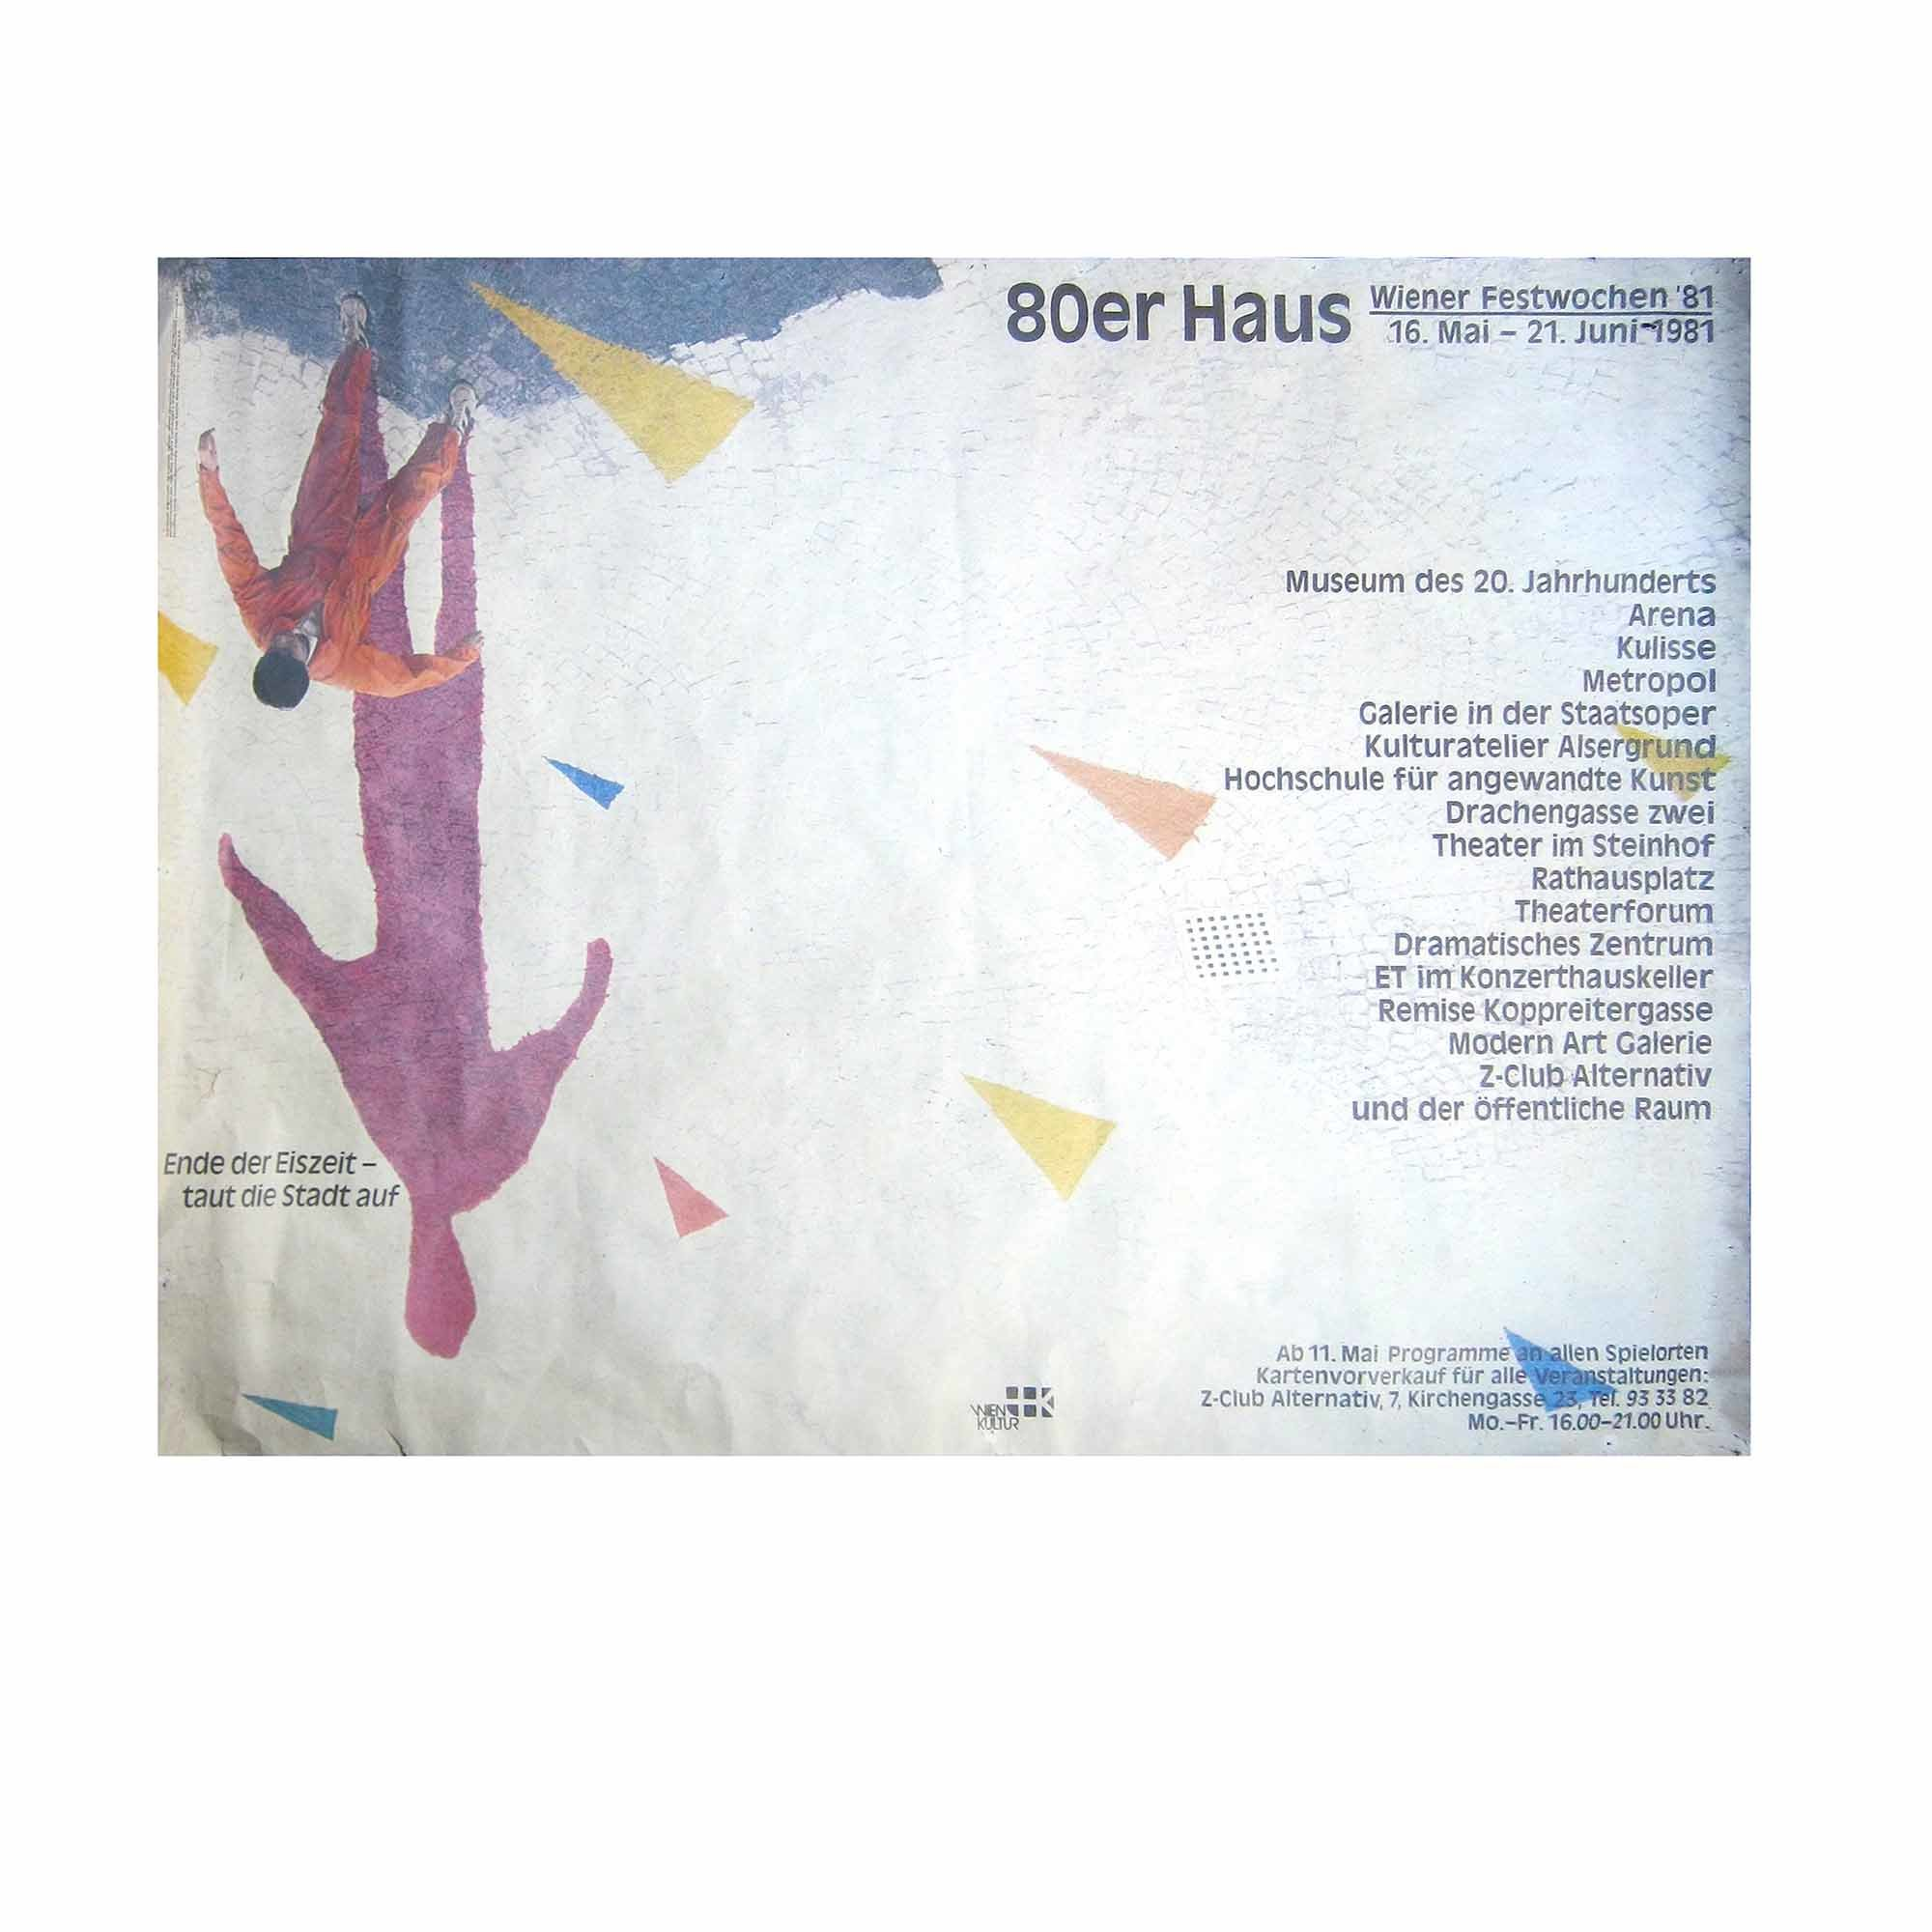 8043 Plakat Gmeiner Wiener Festwochen 1981 N